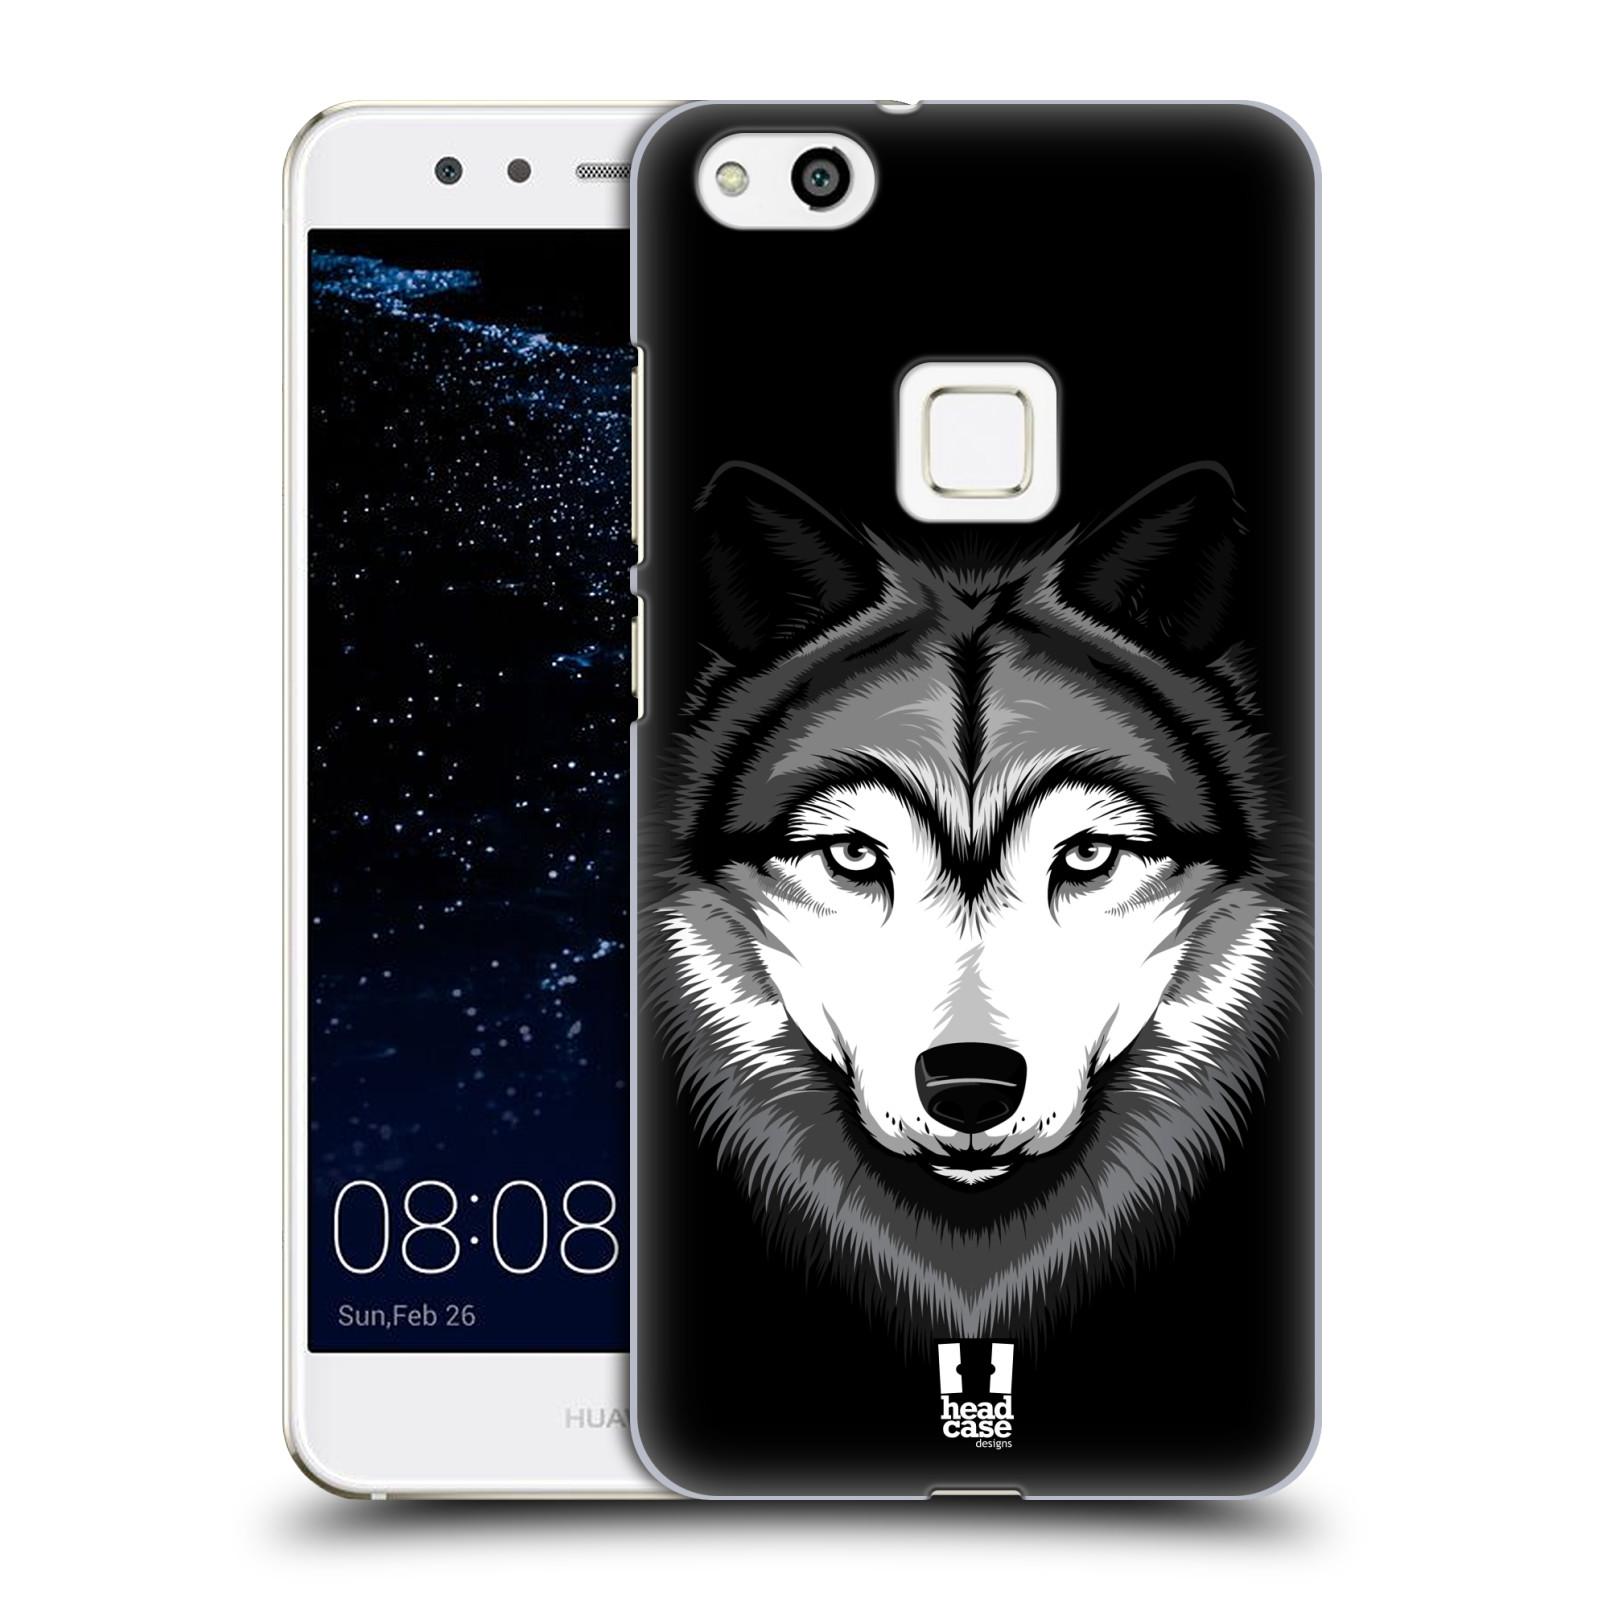 Plastové pouzdro na mobil Huawei P10 Lite Head Case - ILUSTROVANÝ VLK (Plastový kryt či obal na mobilní telefon Huawei P10 Lite Dual SIM (LX1/LX1A))